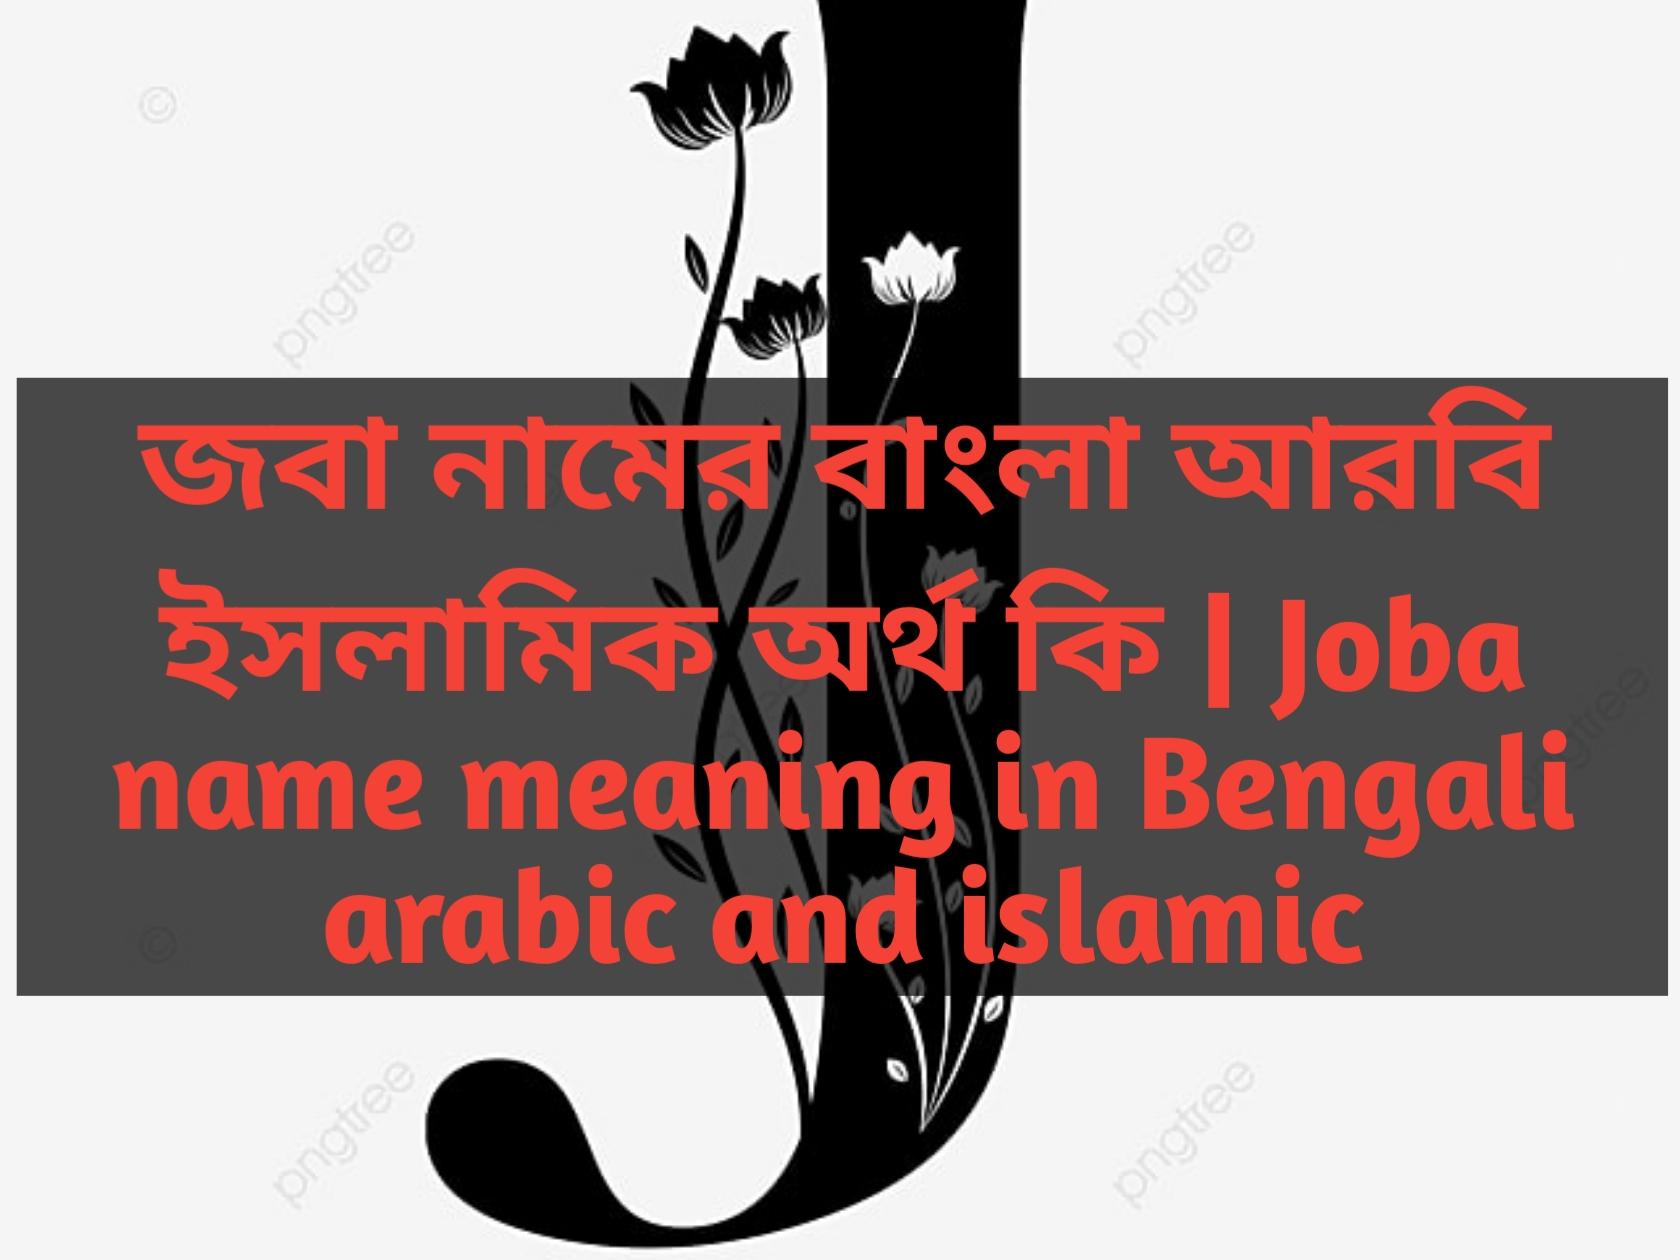 Joba name meaning in Bengali, জবা নামের অর্থ কি, জবা নামের বাংলা অর্থ কি, জবা নামের ইসলামিক অর্থ কি,